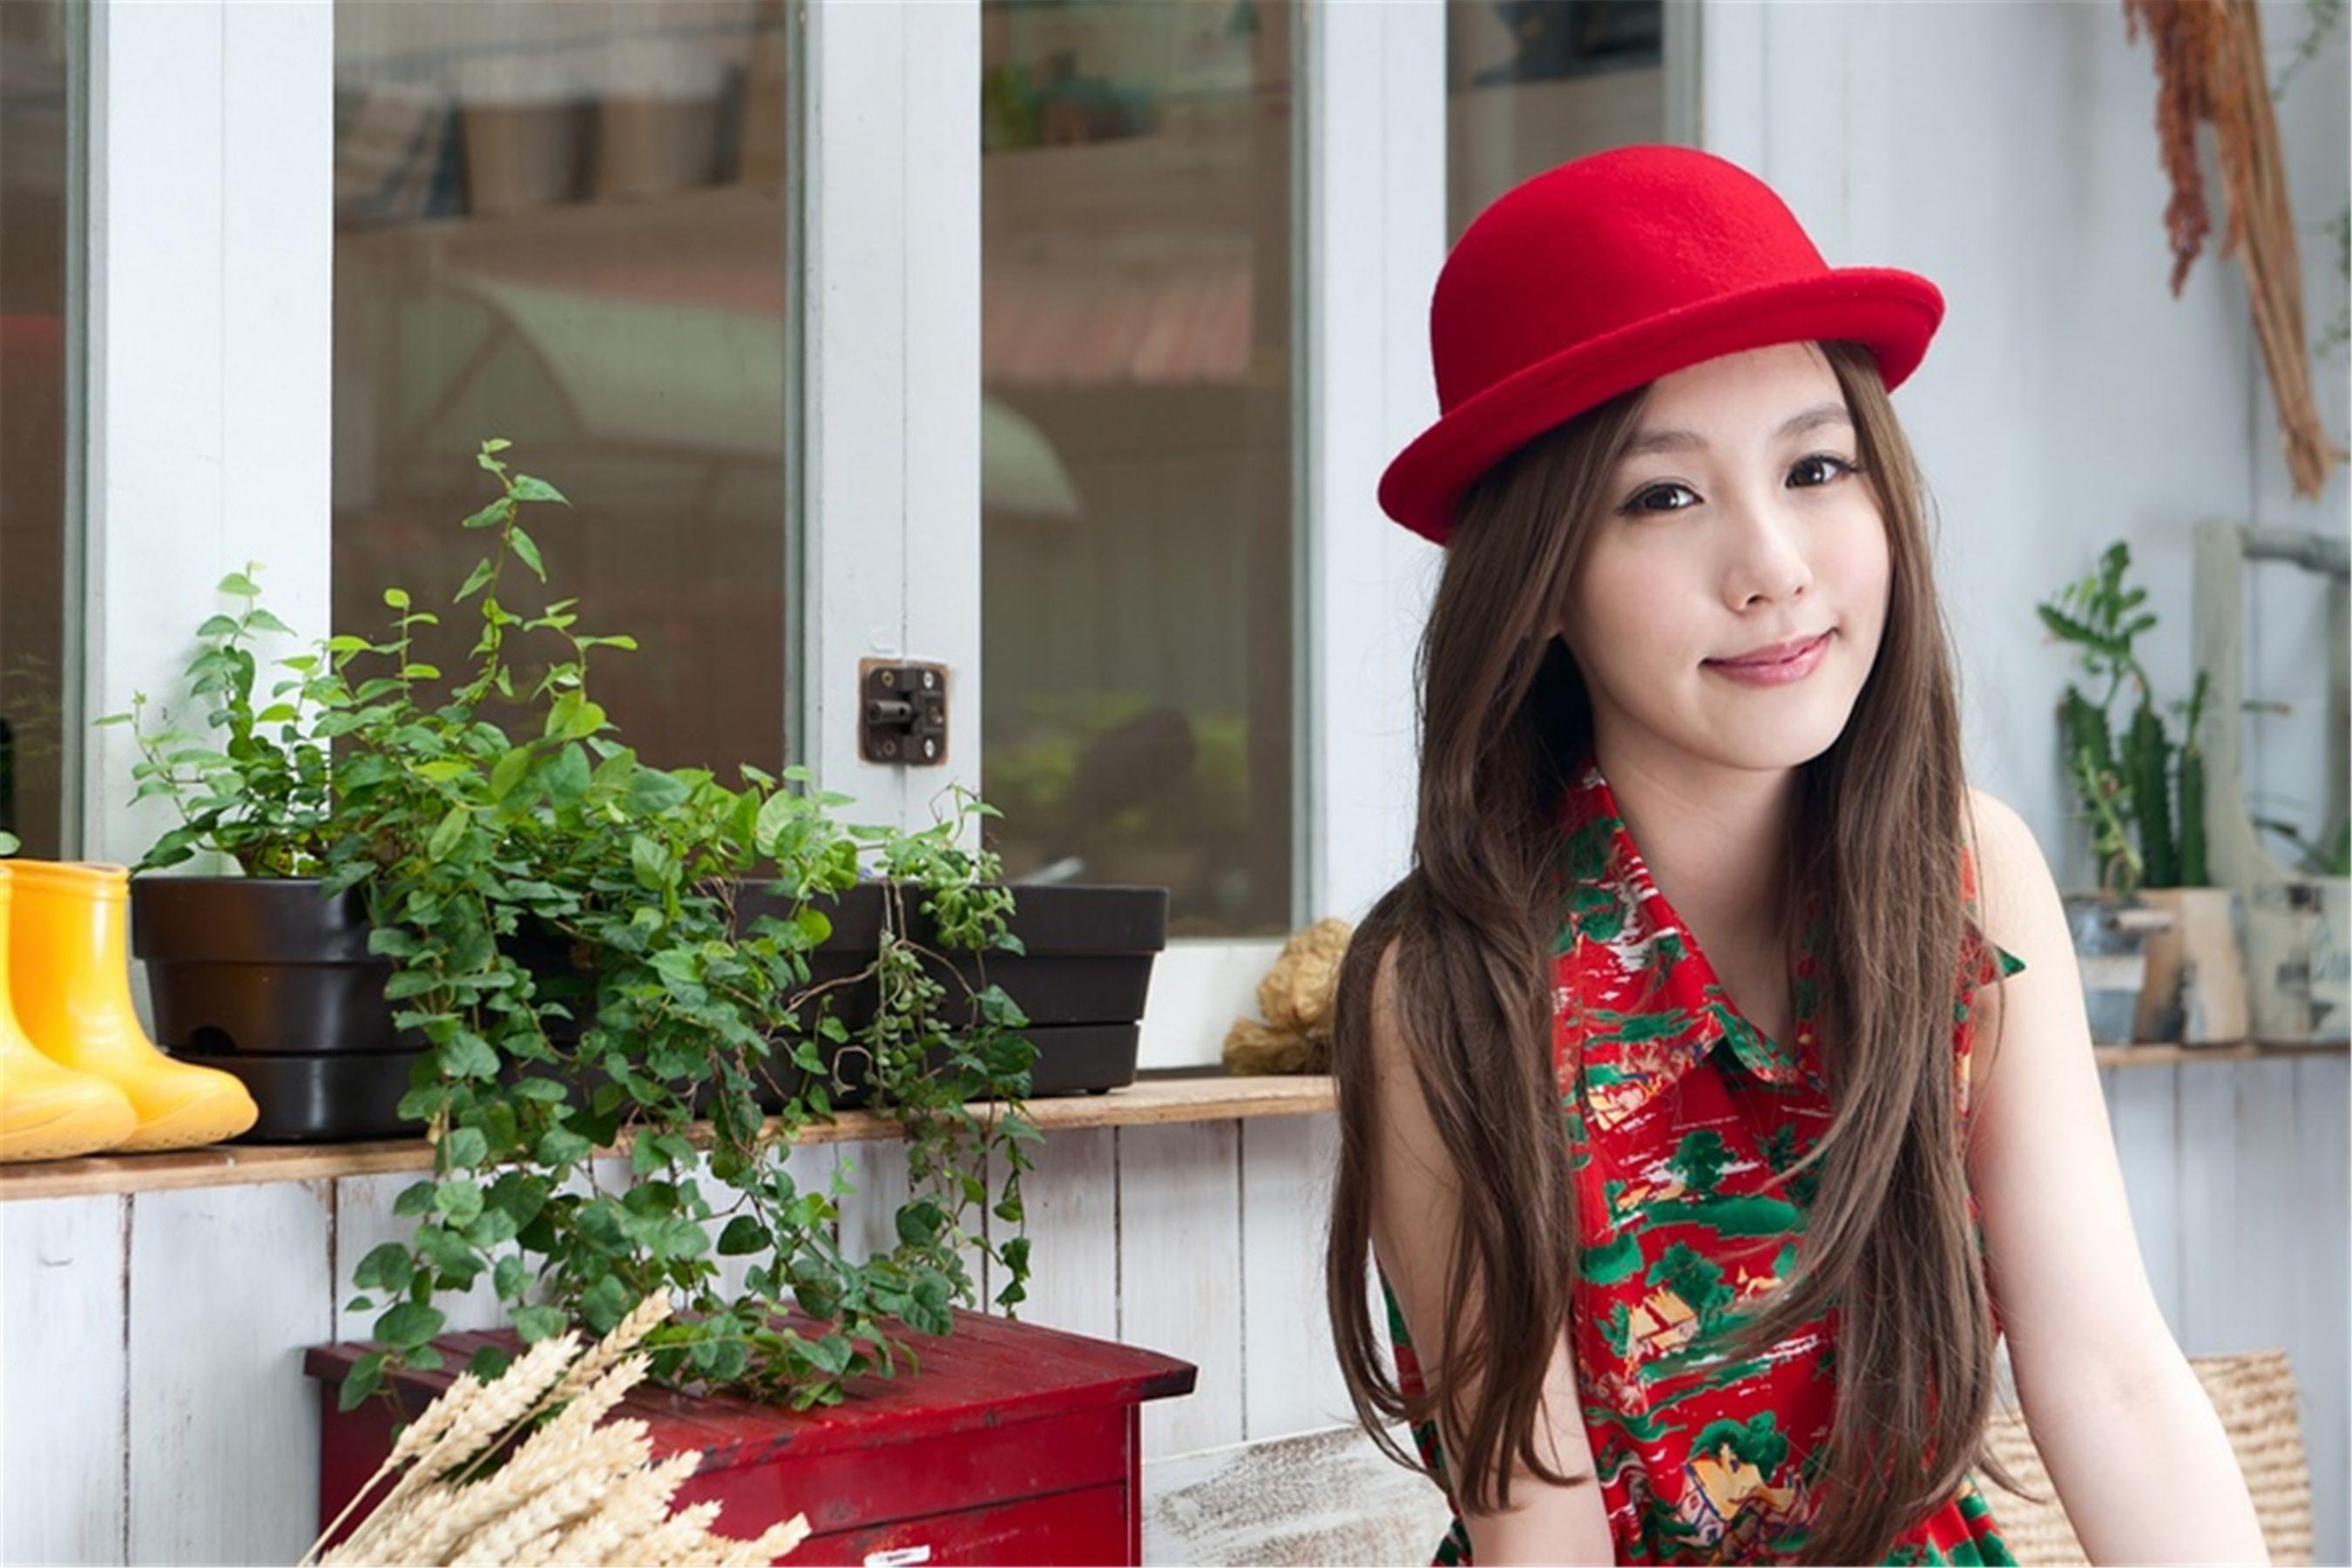 VOL.309 [台湾正妹]清纯甜美正妹优雅美女B罩杯美女:吕思莹(Kimi步,吕小步)高品质写真套图(39P)